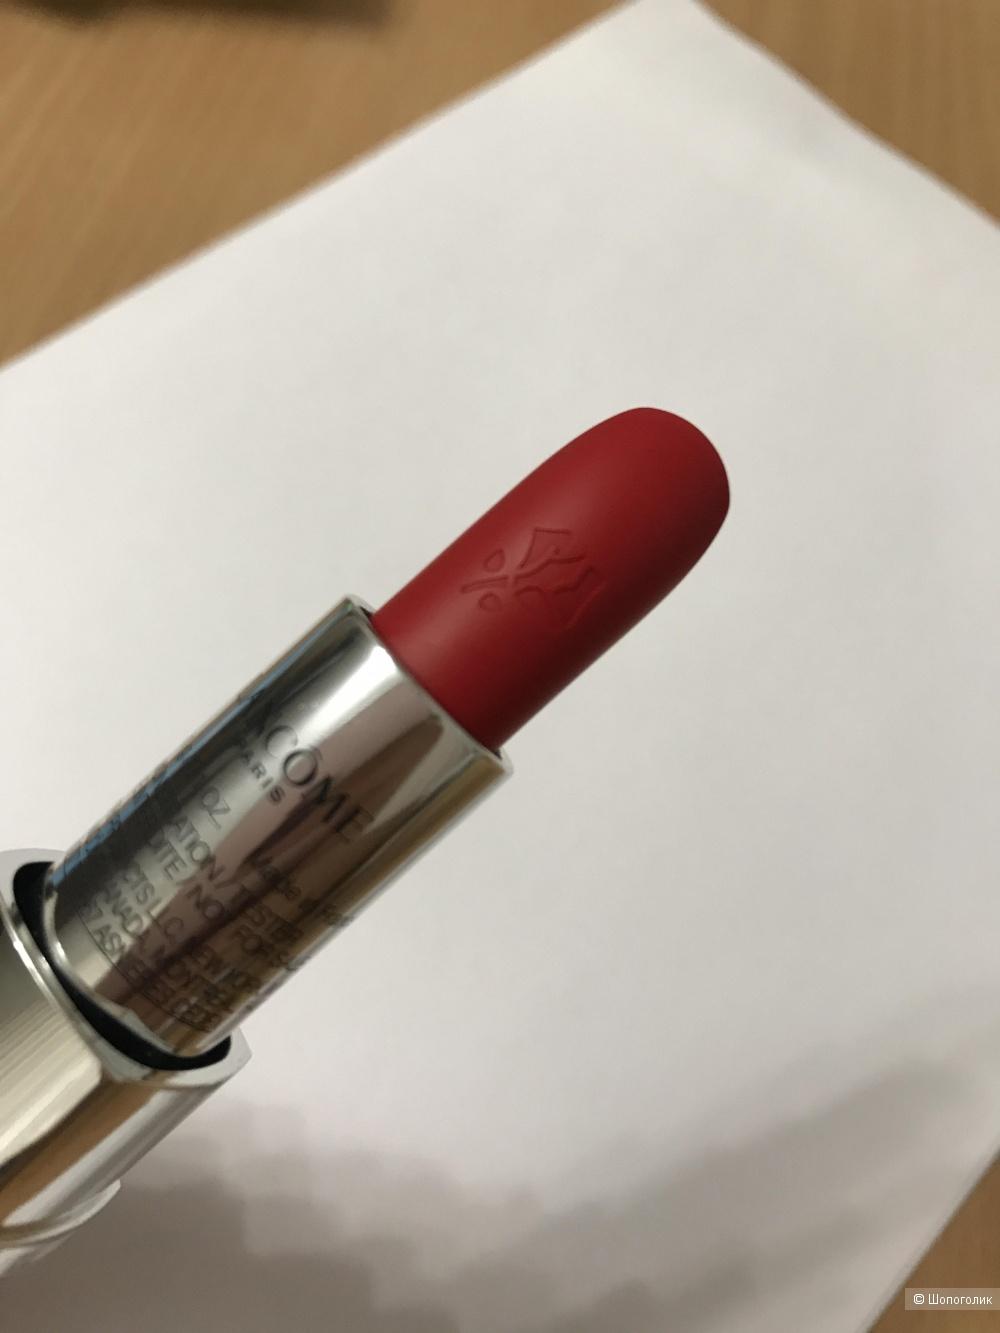 Lancôme Губная помада Rouge in Love, 170N.